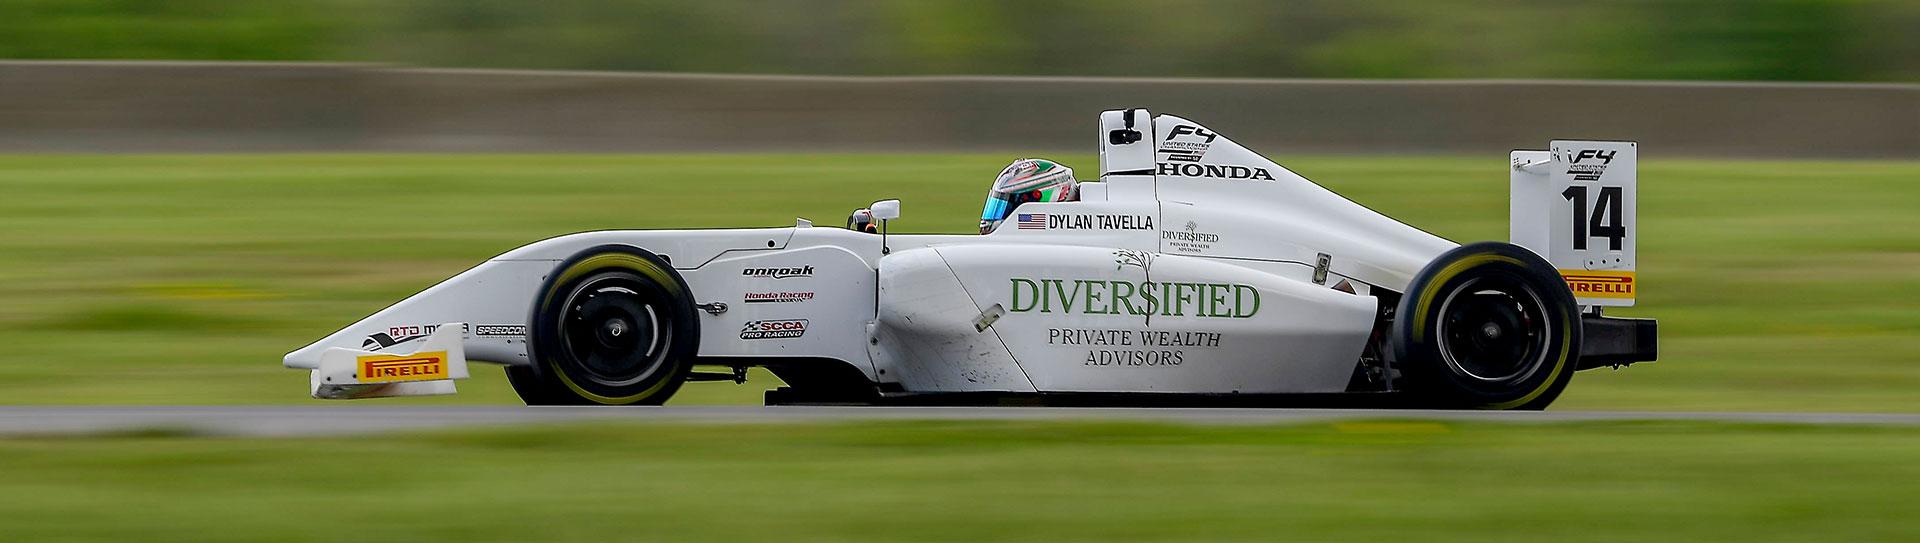 Dylan-tavella-formula-4-car